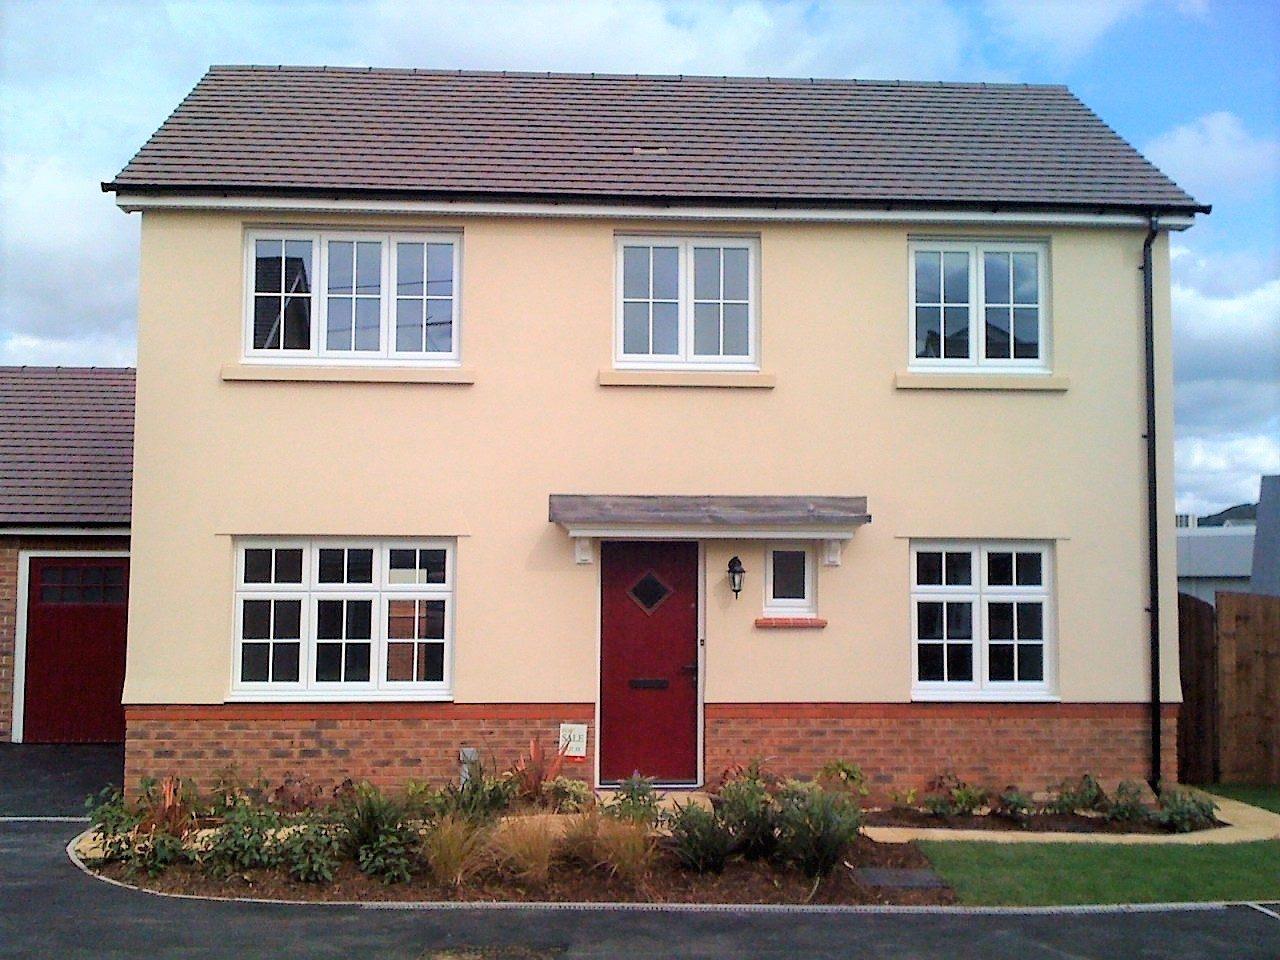 3 Bedroom Detached House to Let in Birchgrove Swansea